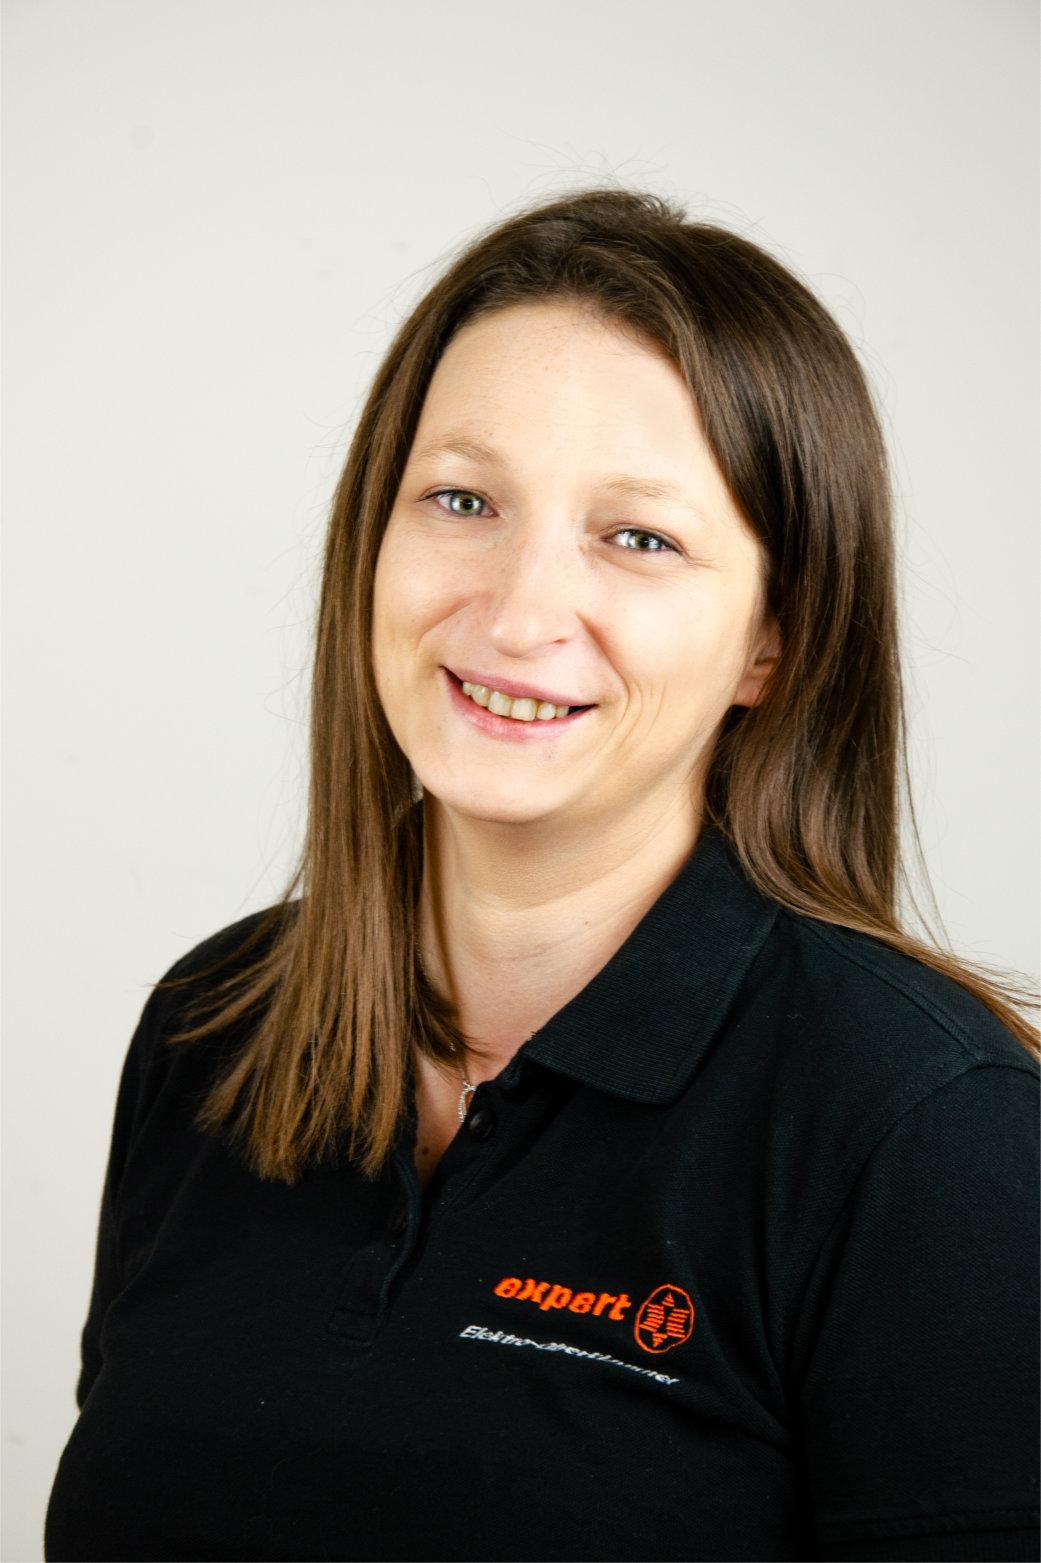 Teuretzbacher Karin